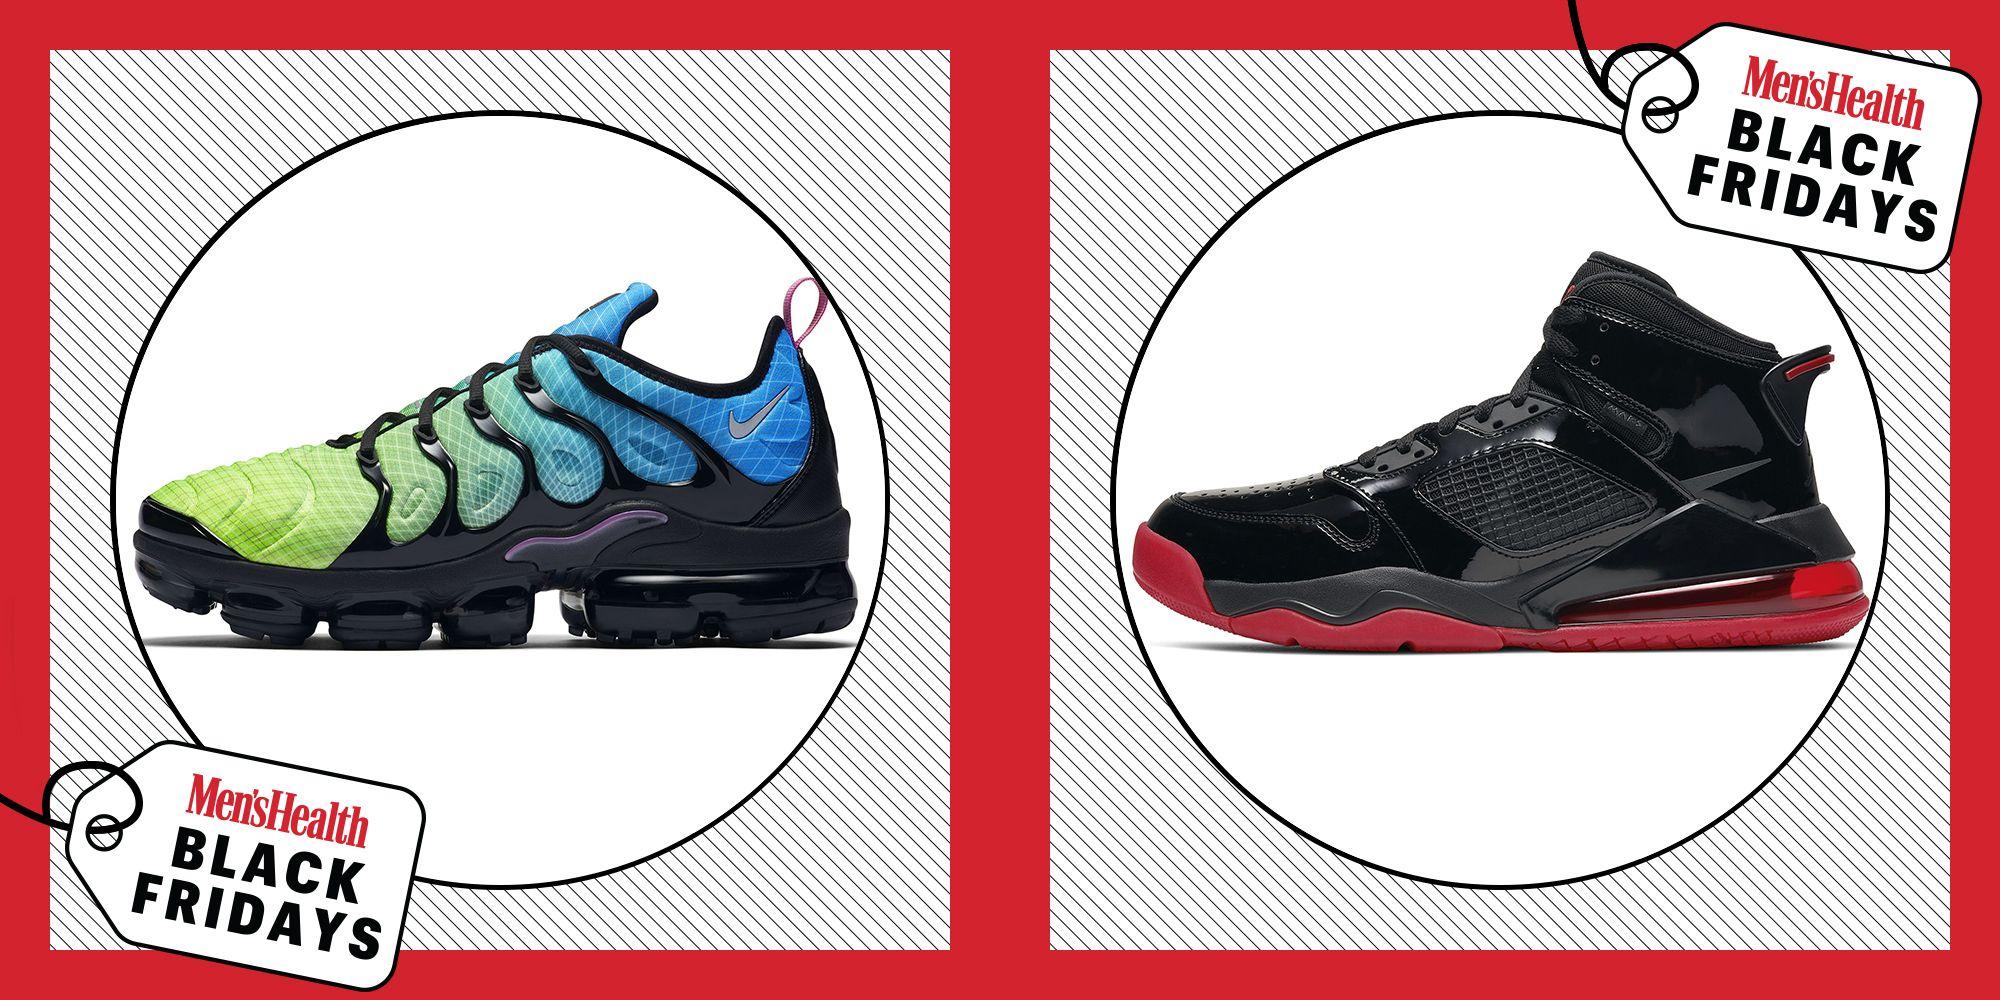 Nike Black Friday Sale - 8 Best Men's